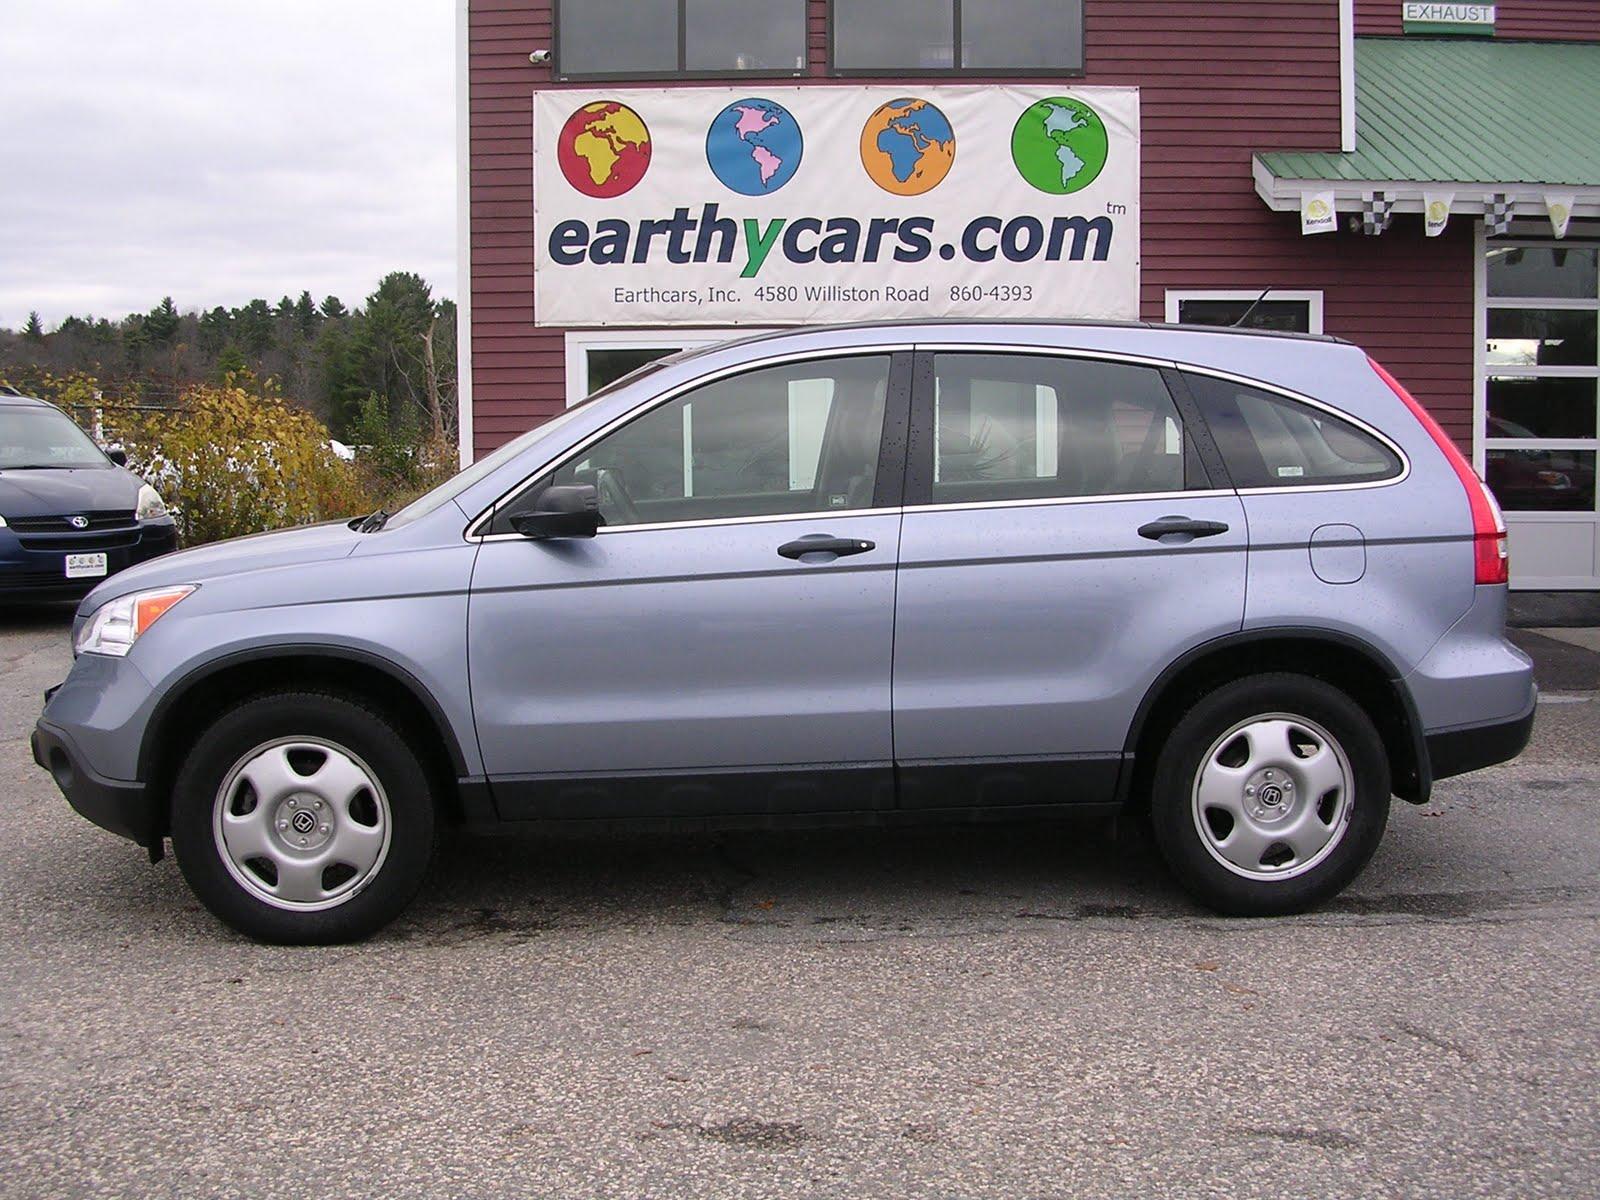 earthy cars blog earthy car of the week blue 2008 honda cr v lx 4wd. Black Bedroom Furniture Sets. Home Design Ideas